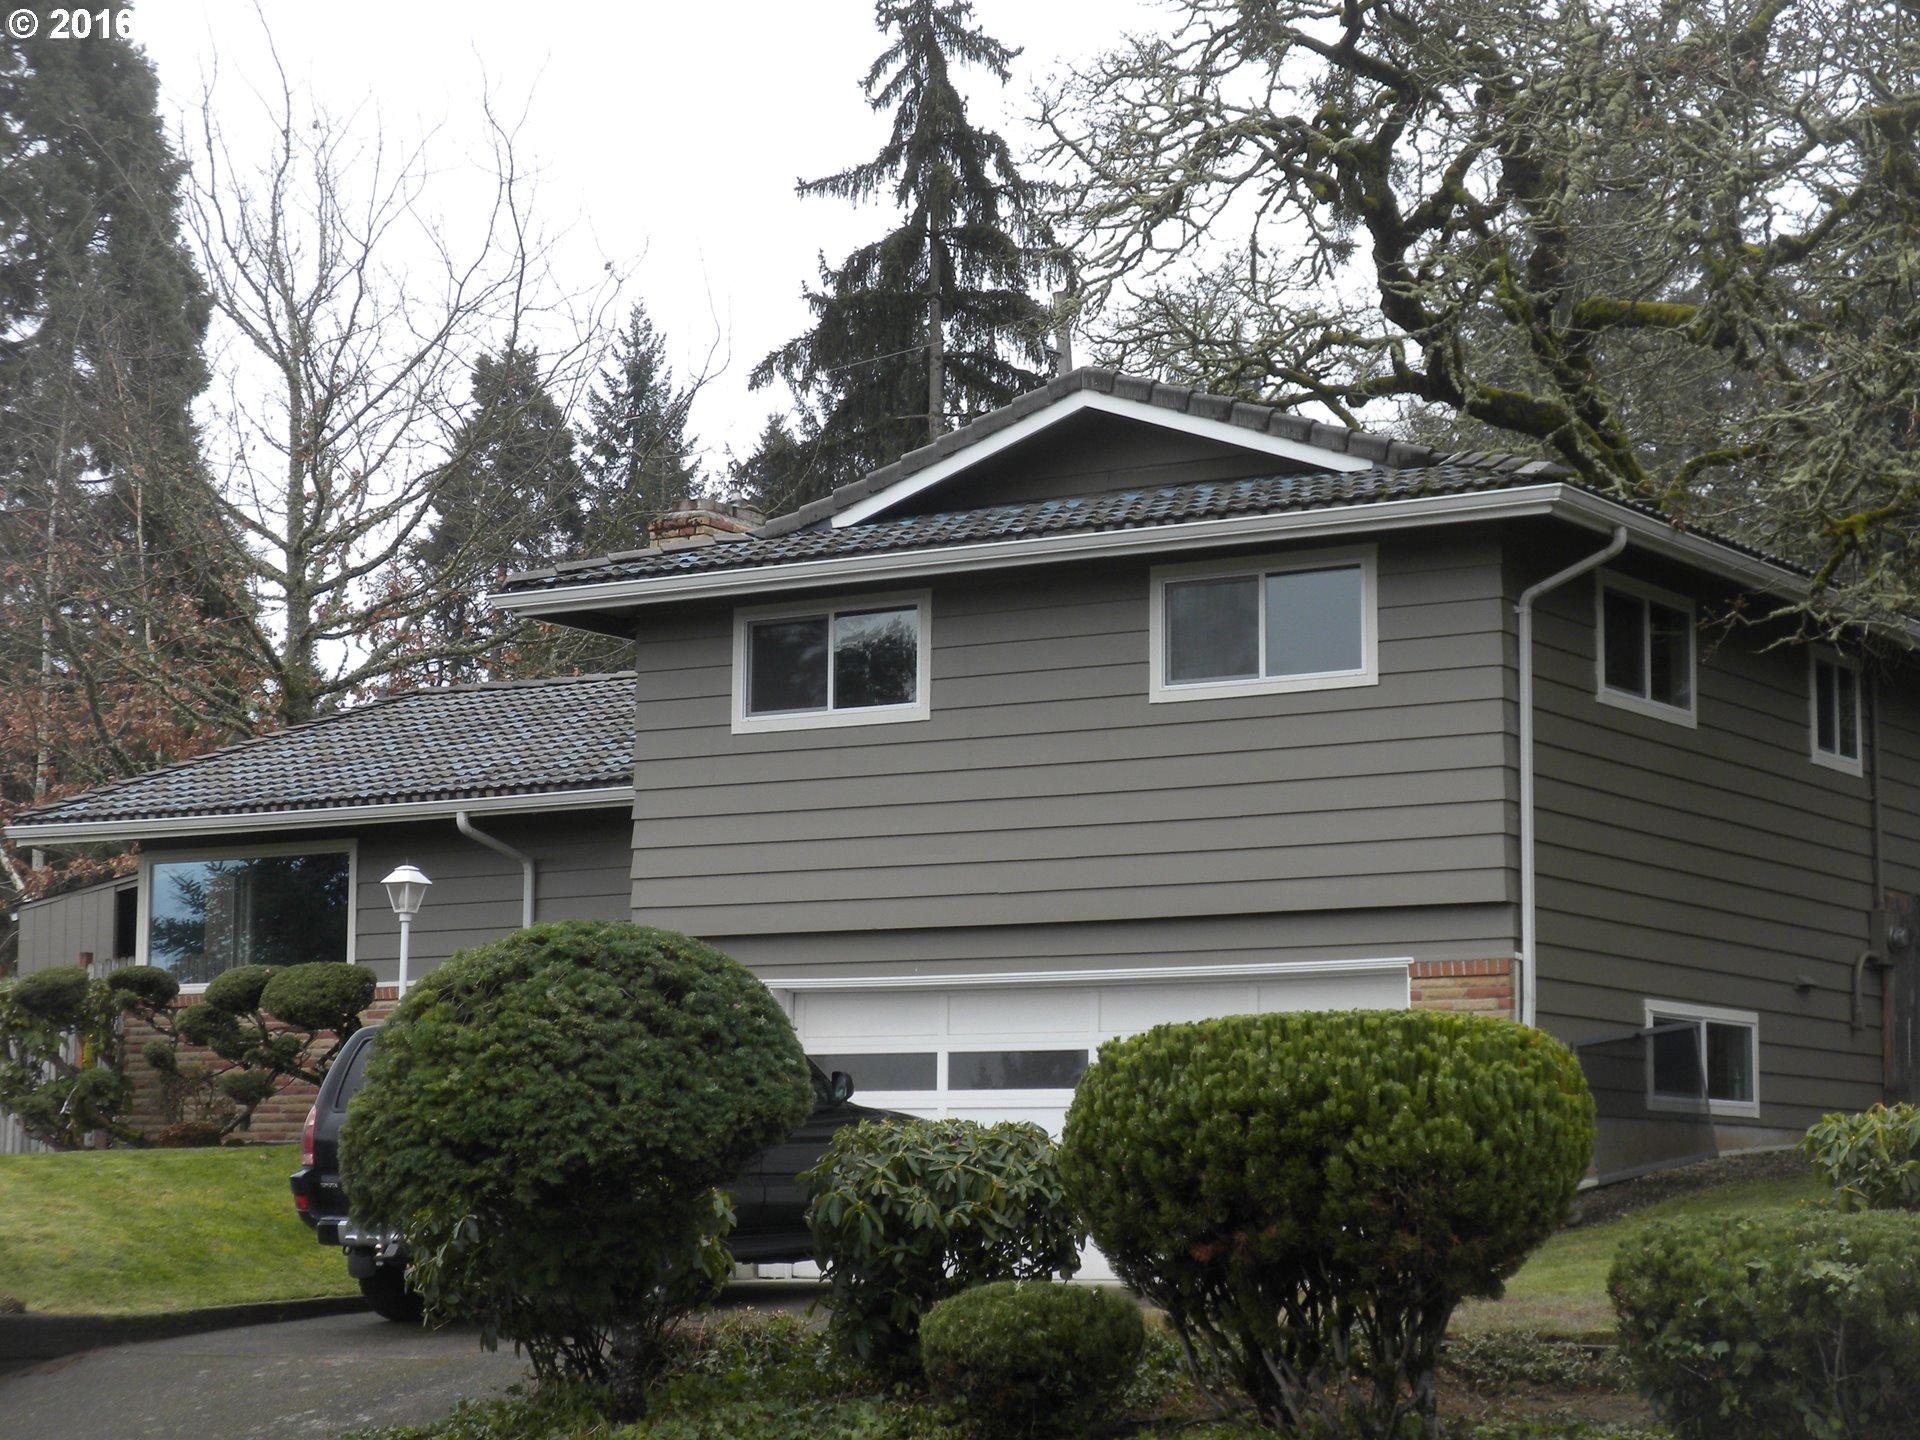 Homes for sale in eugene springfield area eugene oregon for Eugene oregon home builders